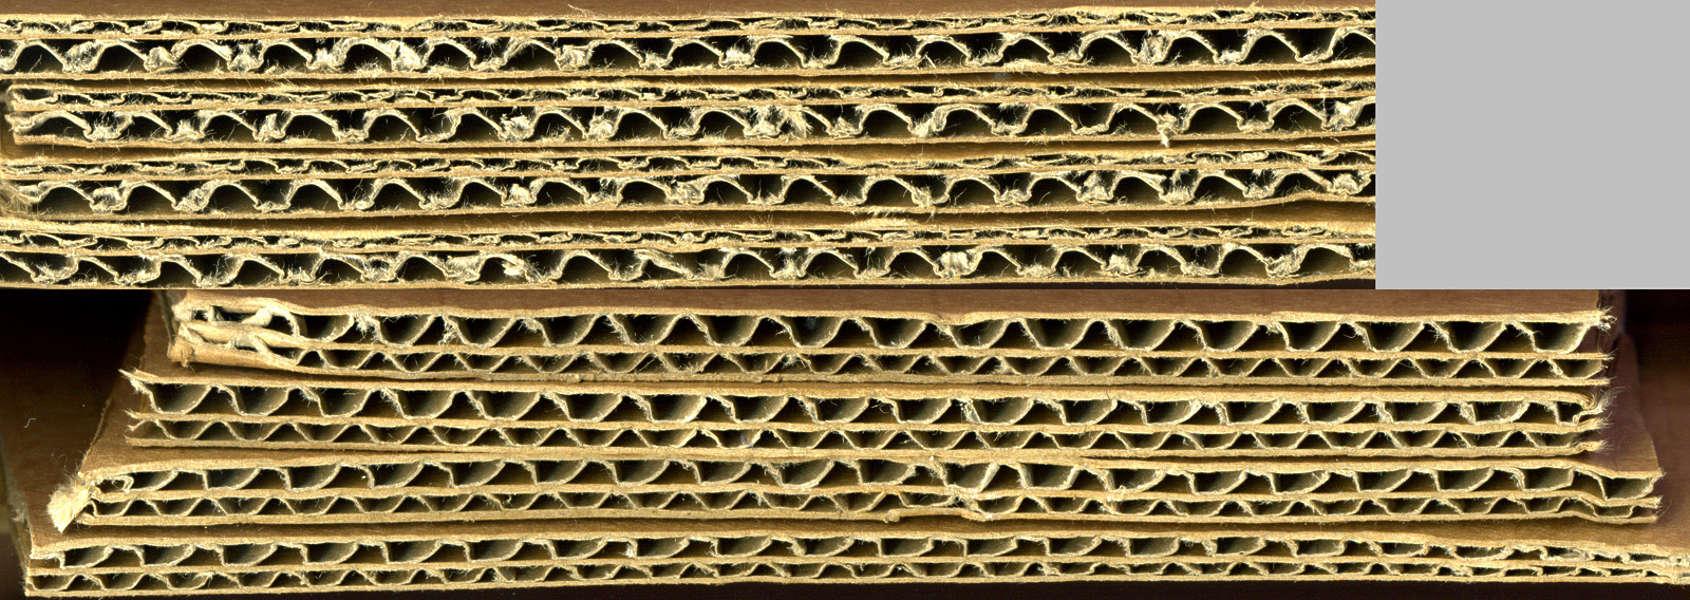 Cardboardplain0003 Free Background Texture Cardboard